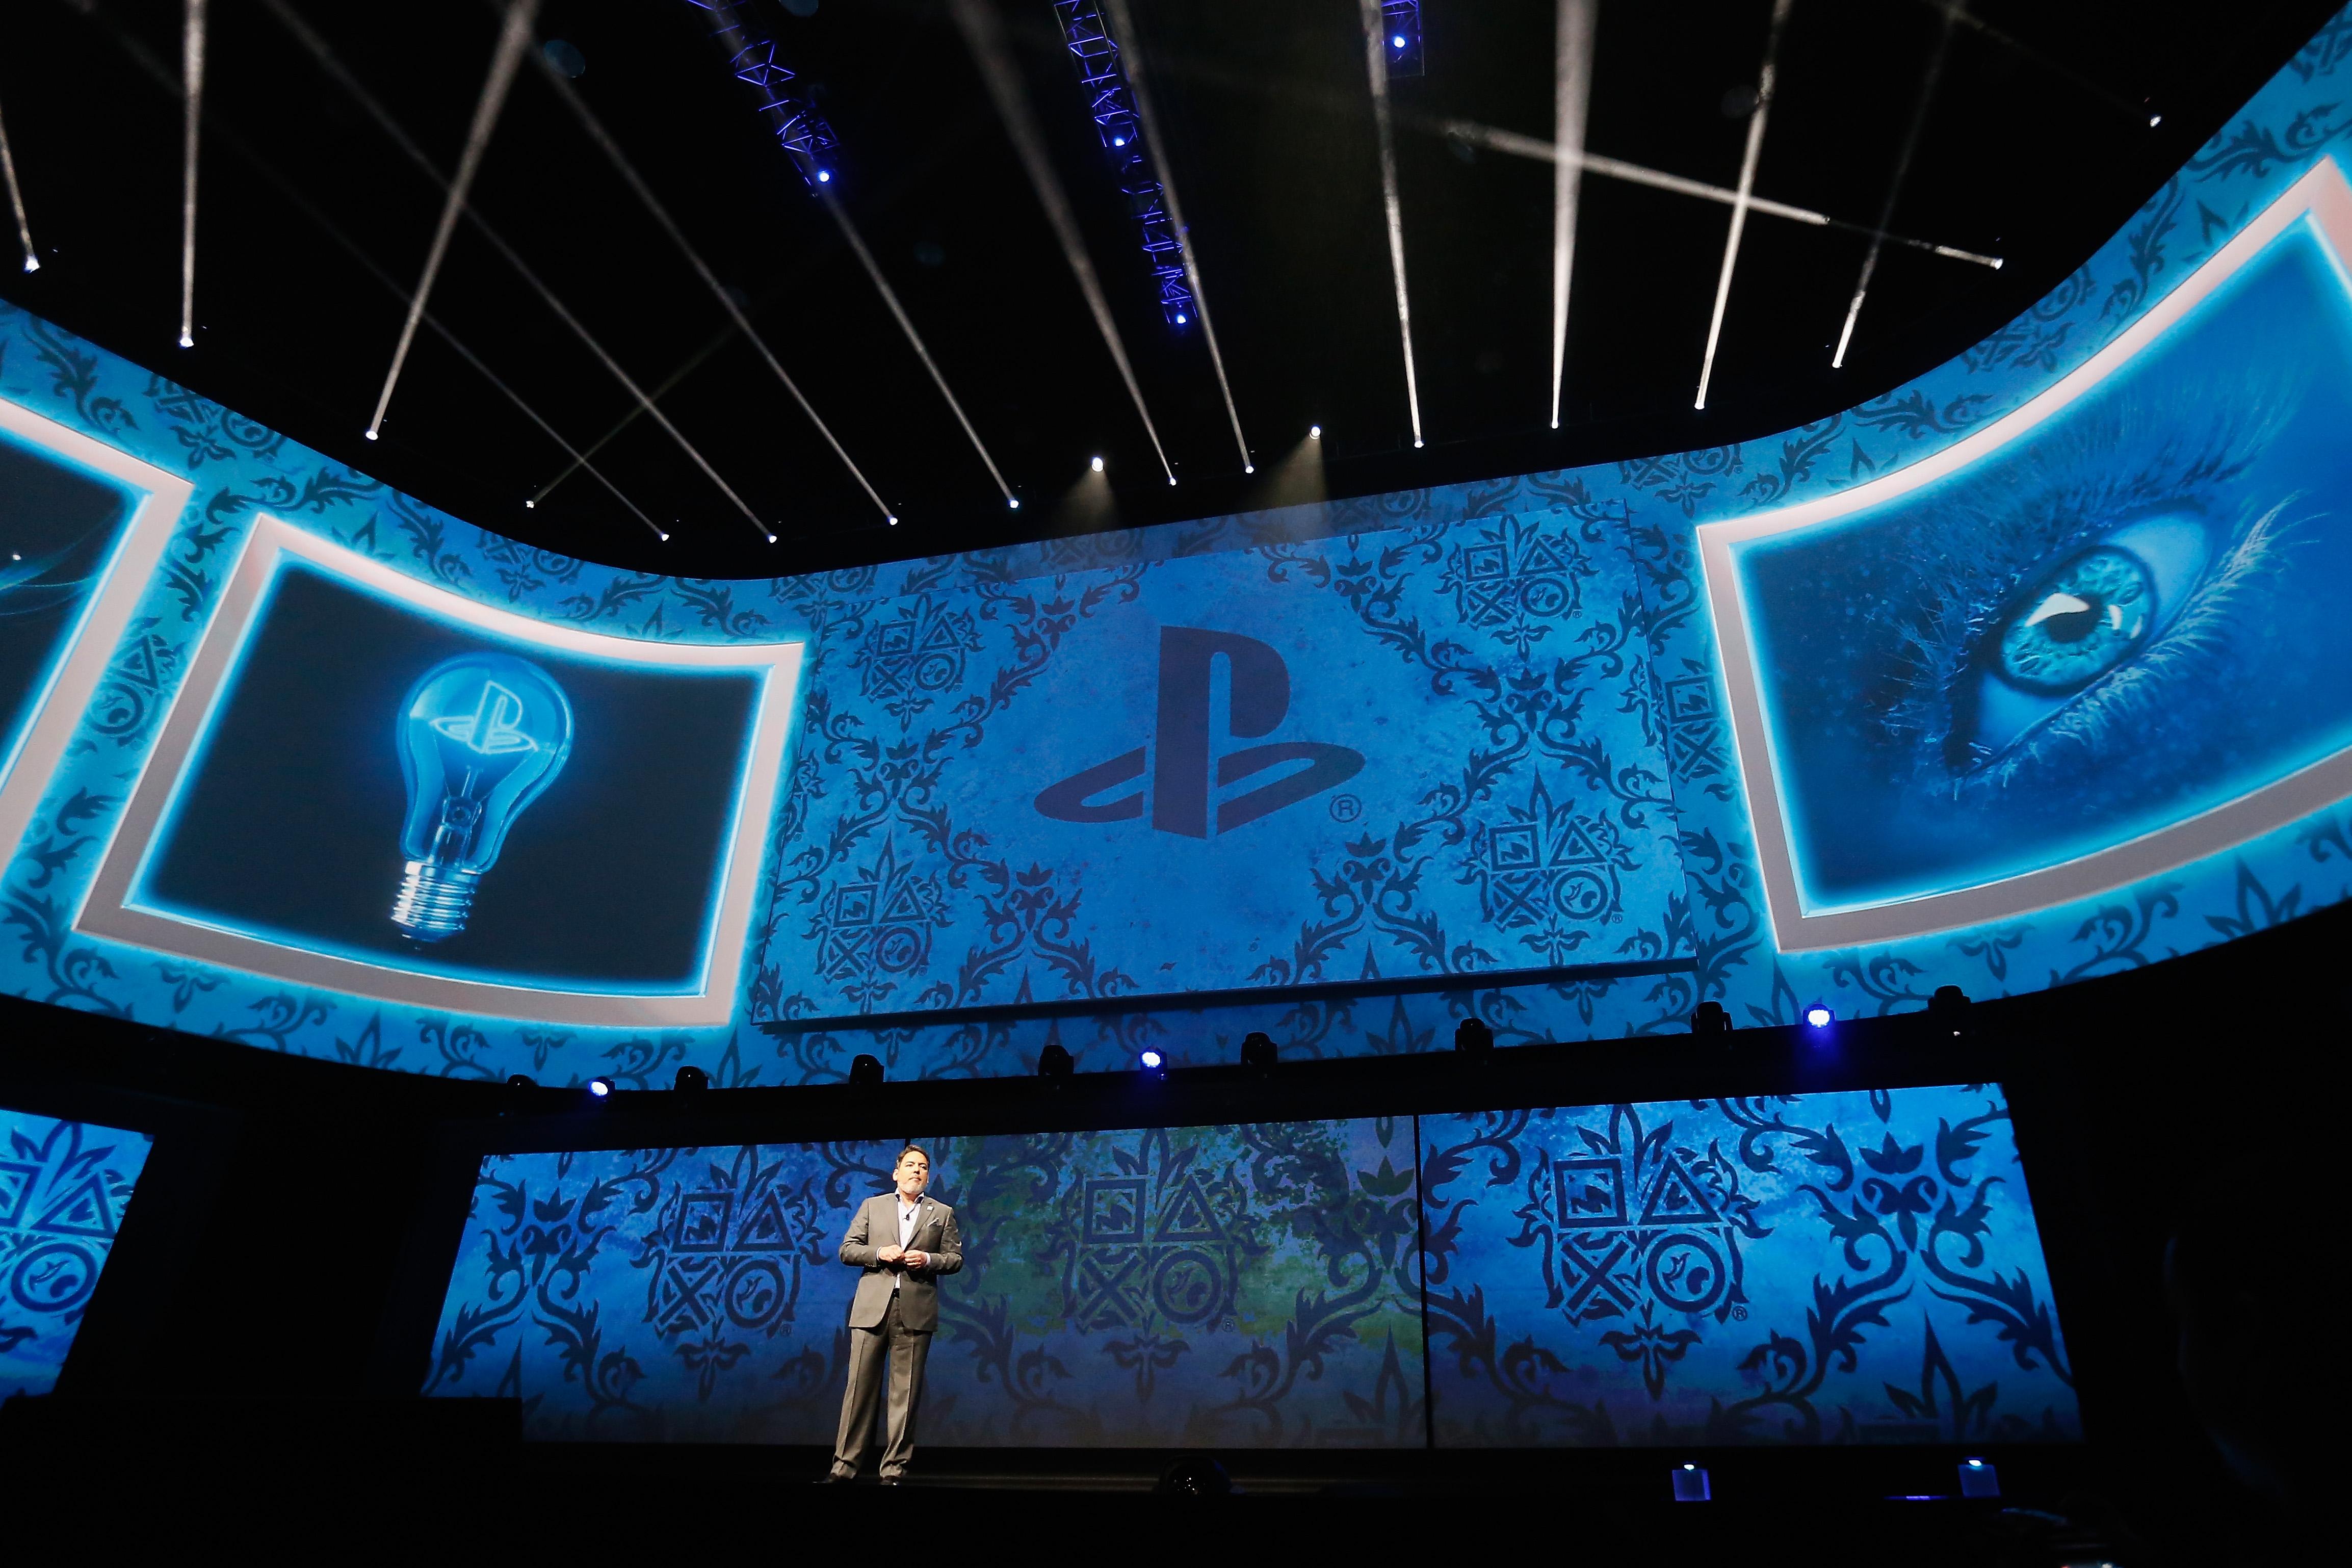 Sony e3 deals